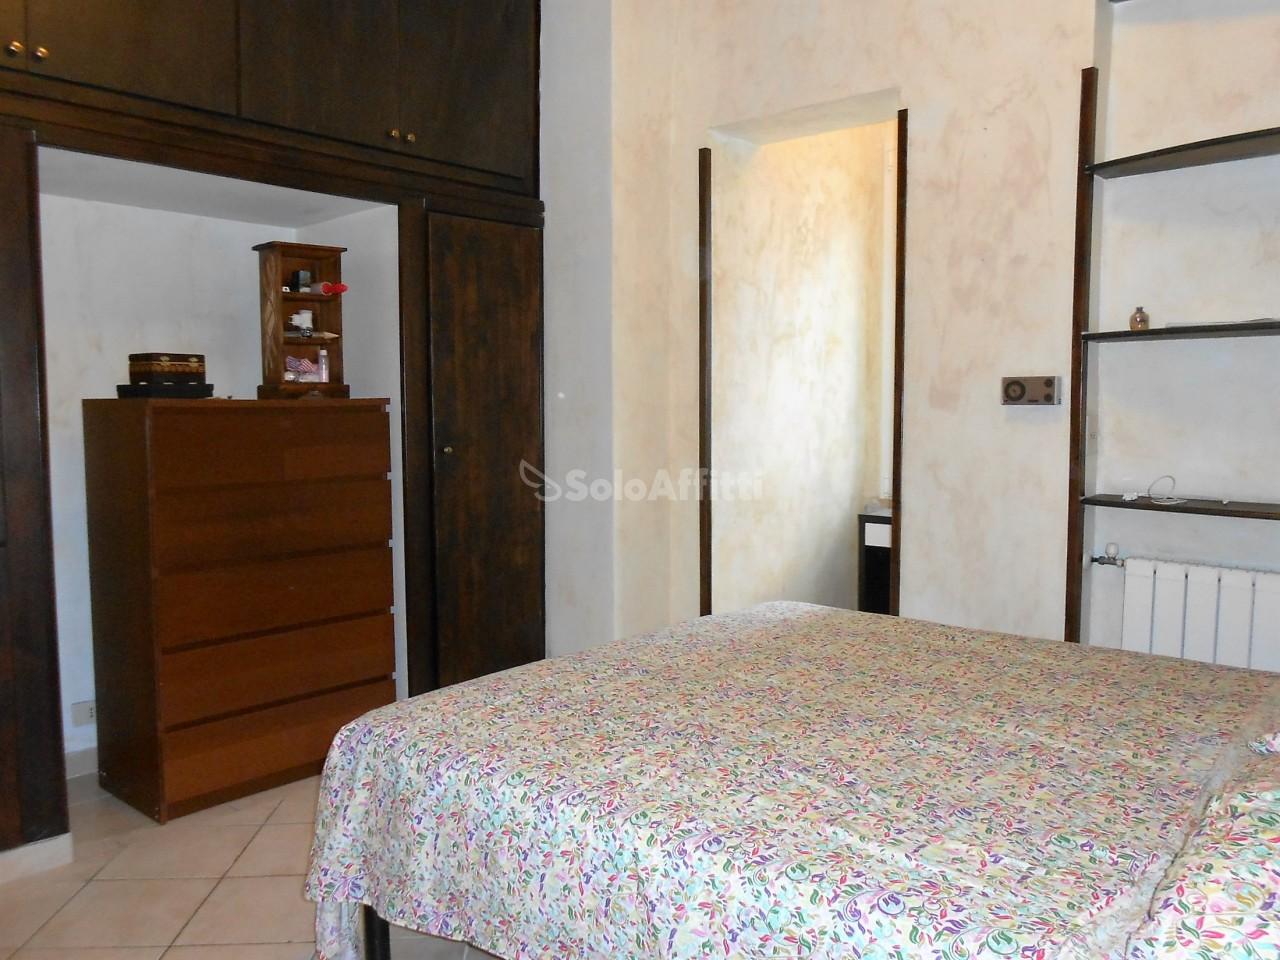 Bilocale Marino Via Calatafimi 59 5